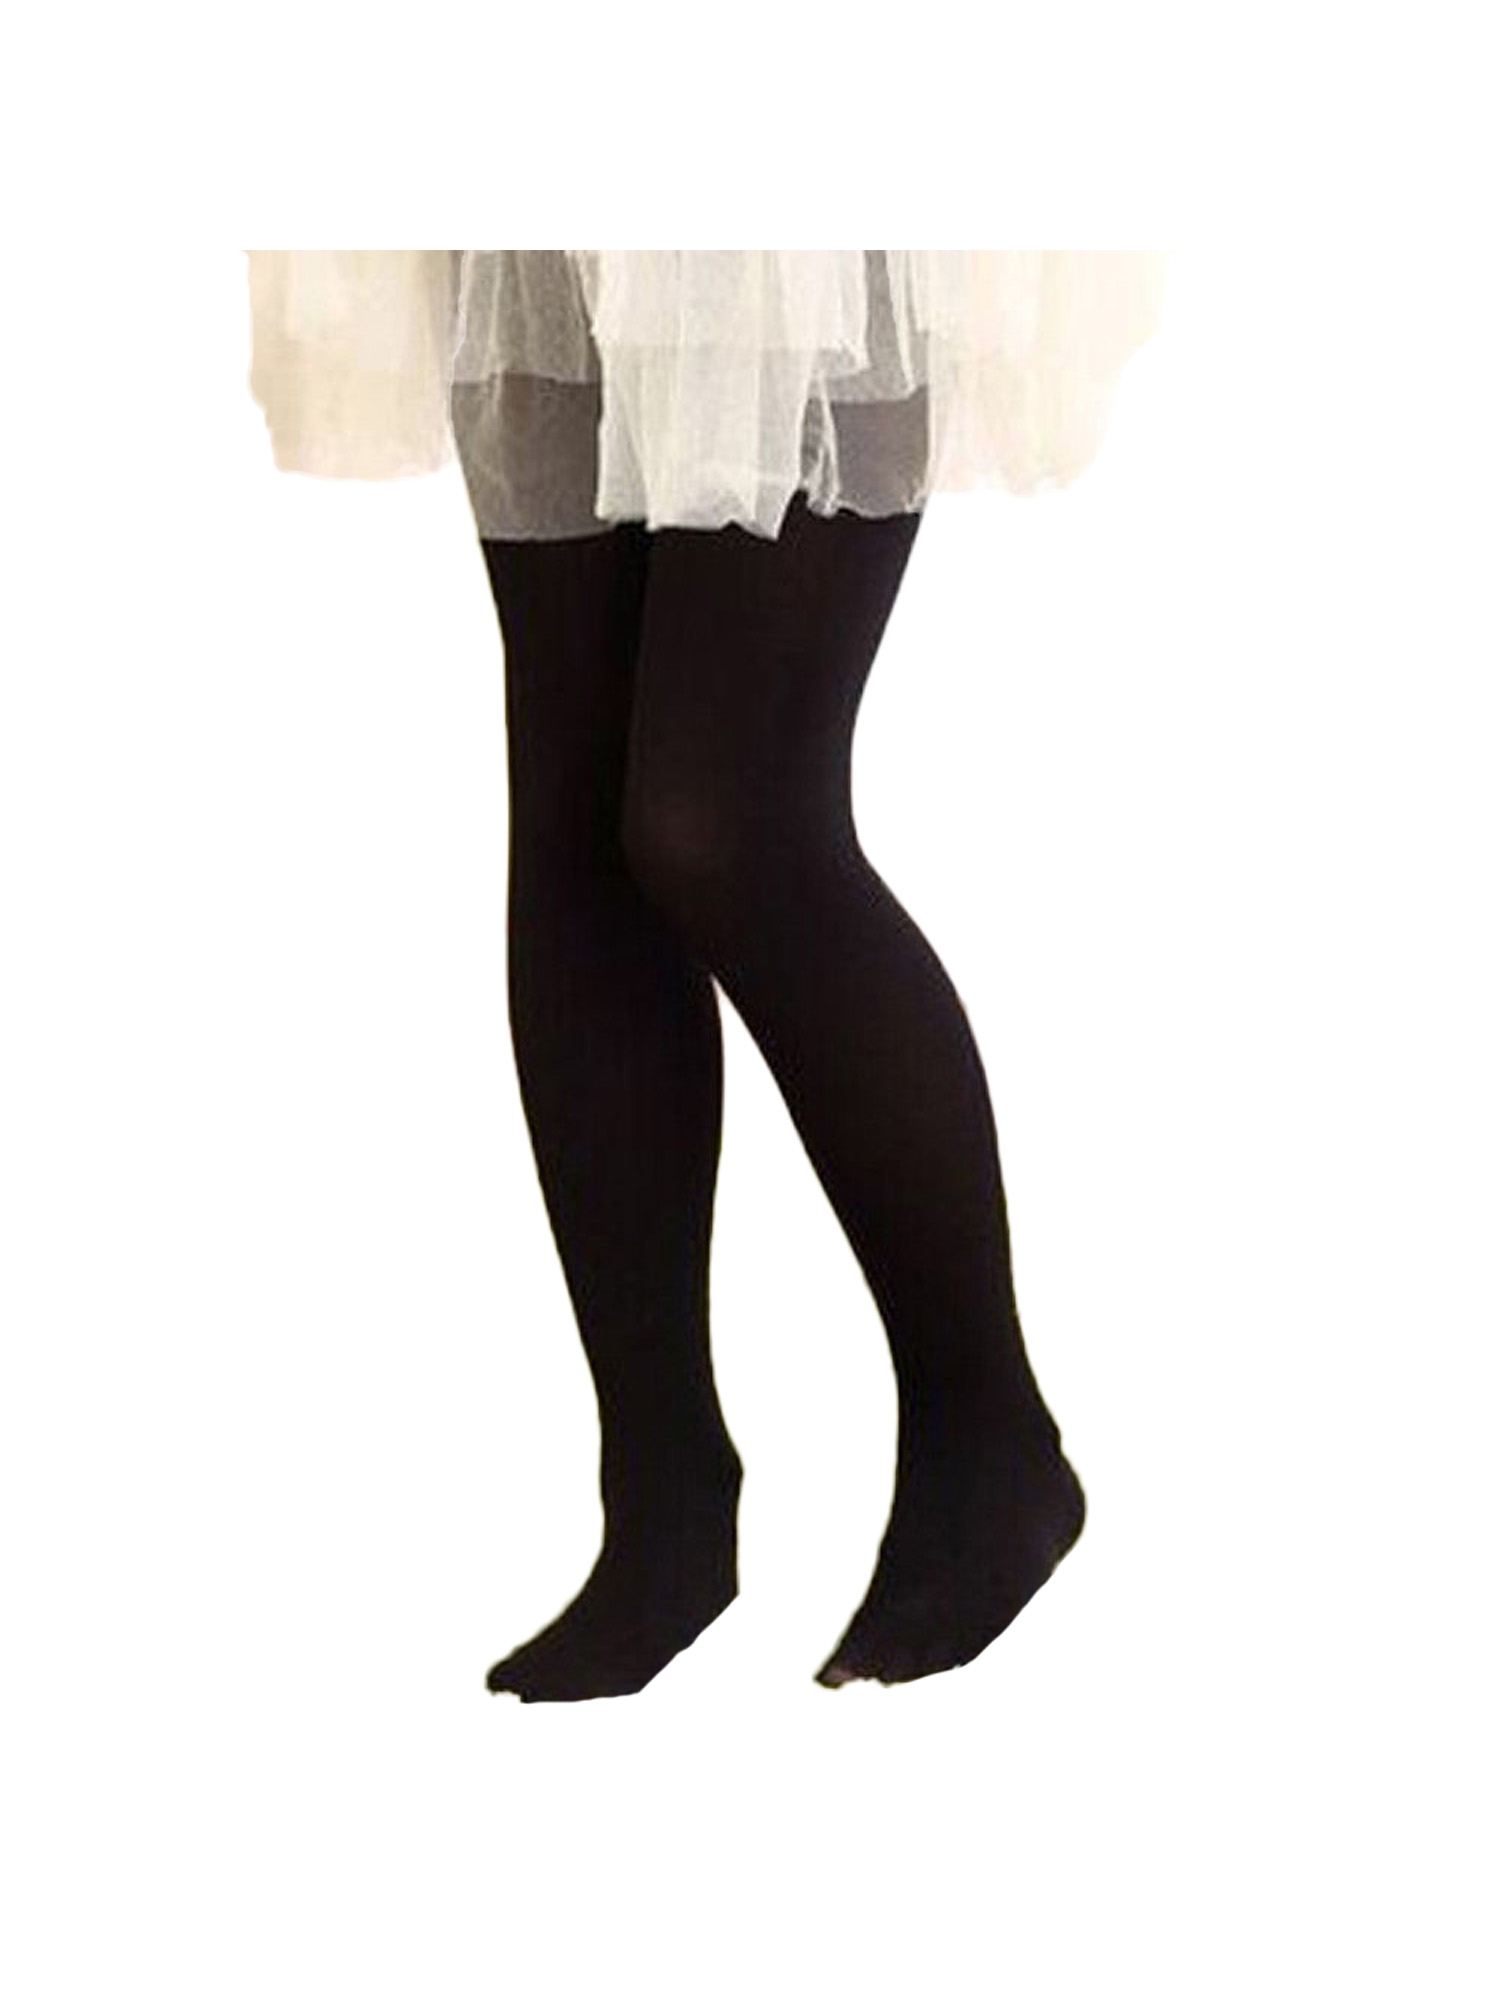 Kids Girls Tights Opaque Pantyhose Hosiery Stocking Ballet Dance Socks CB